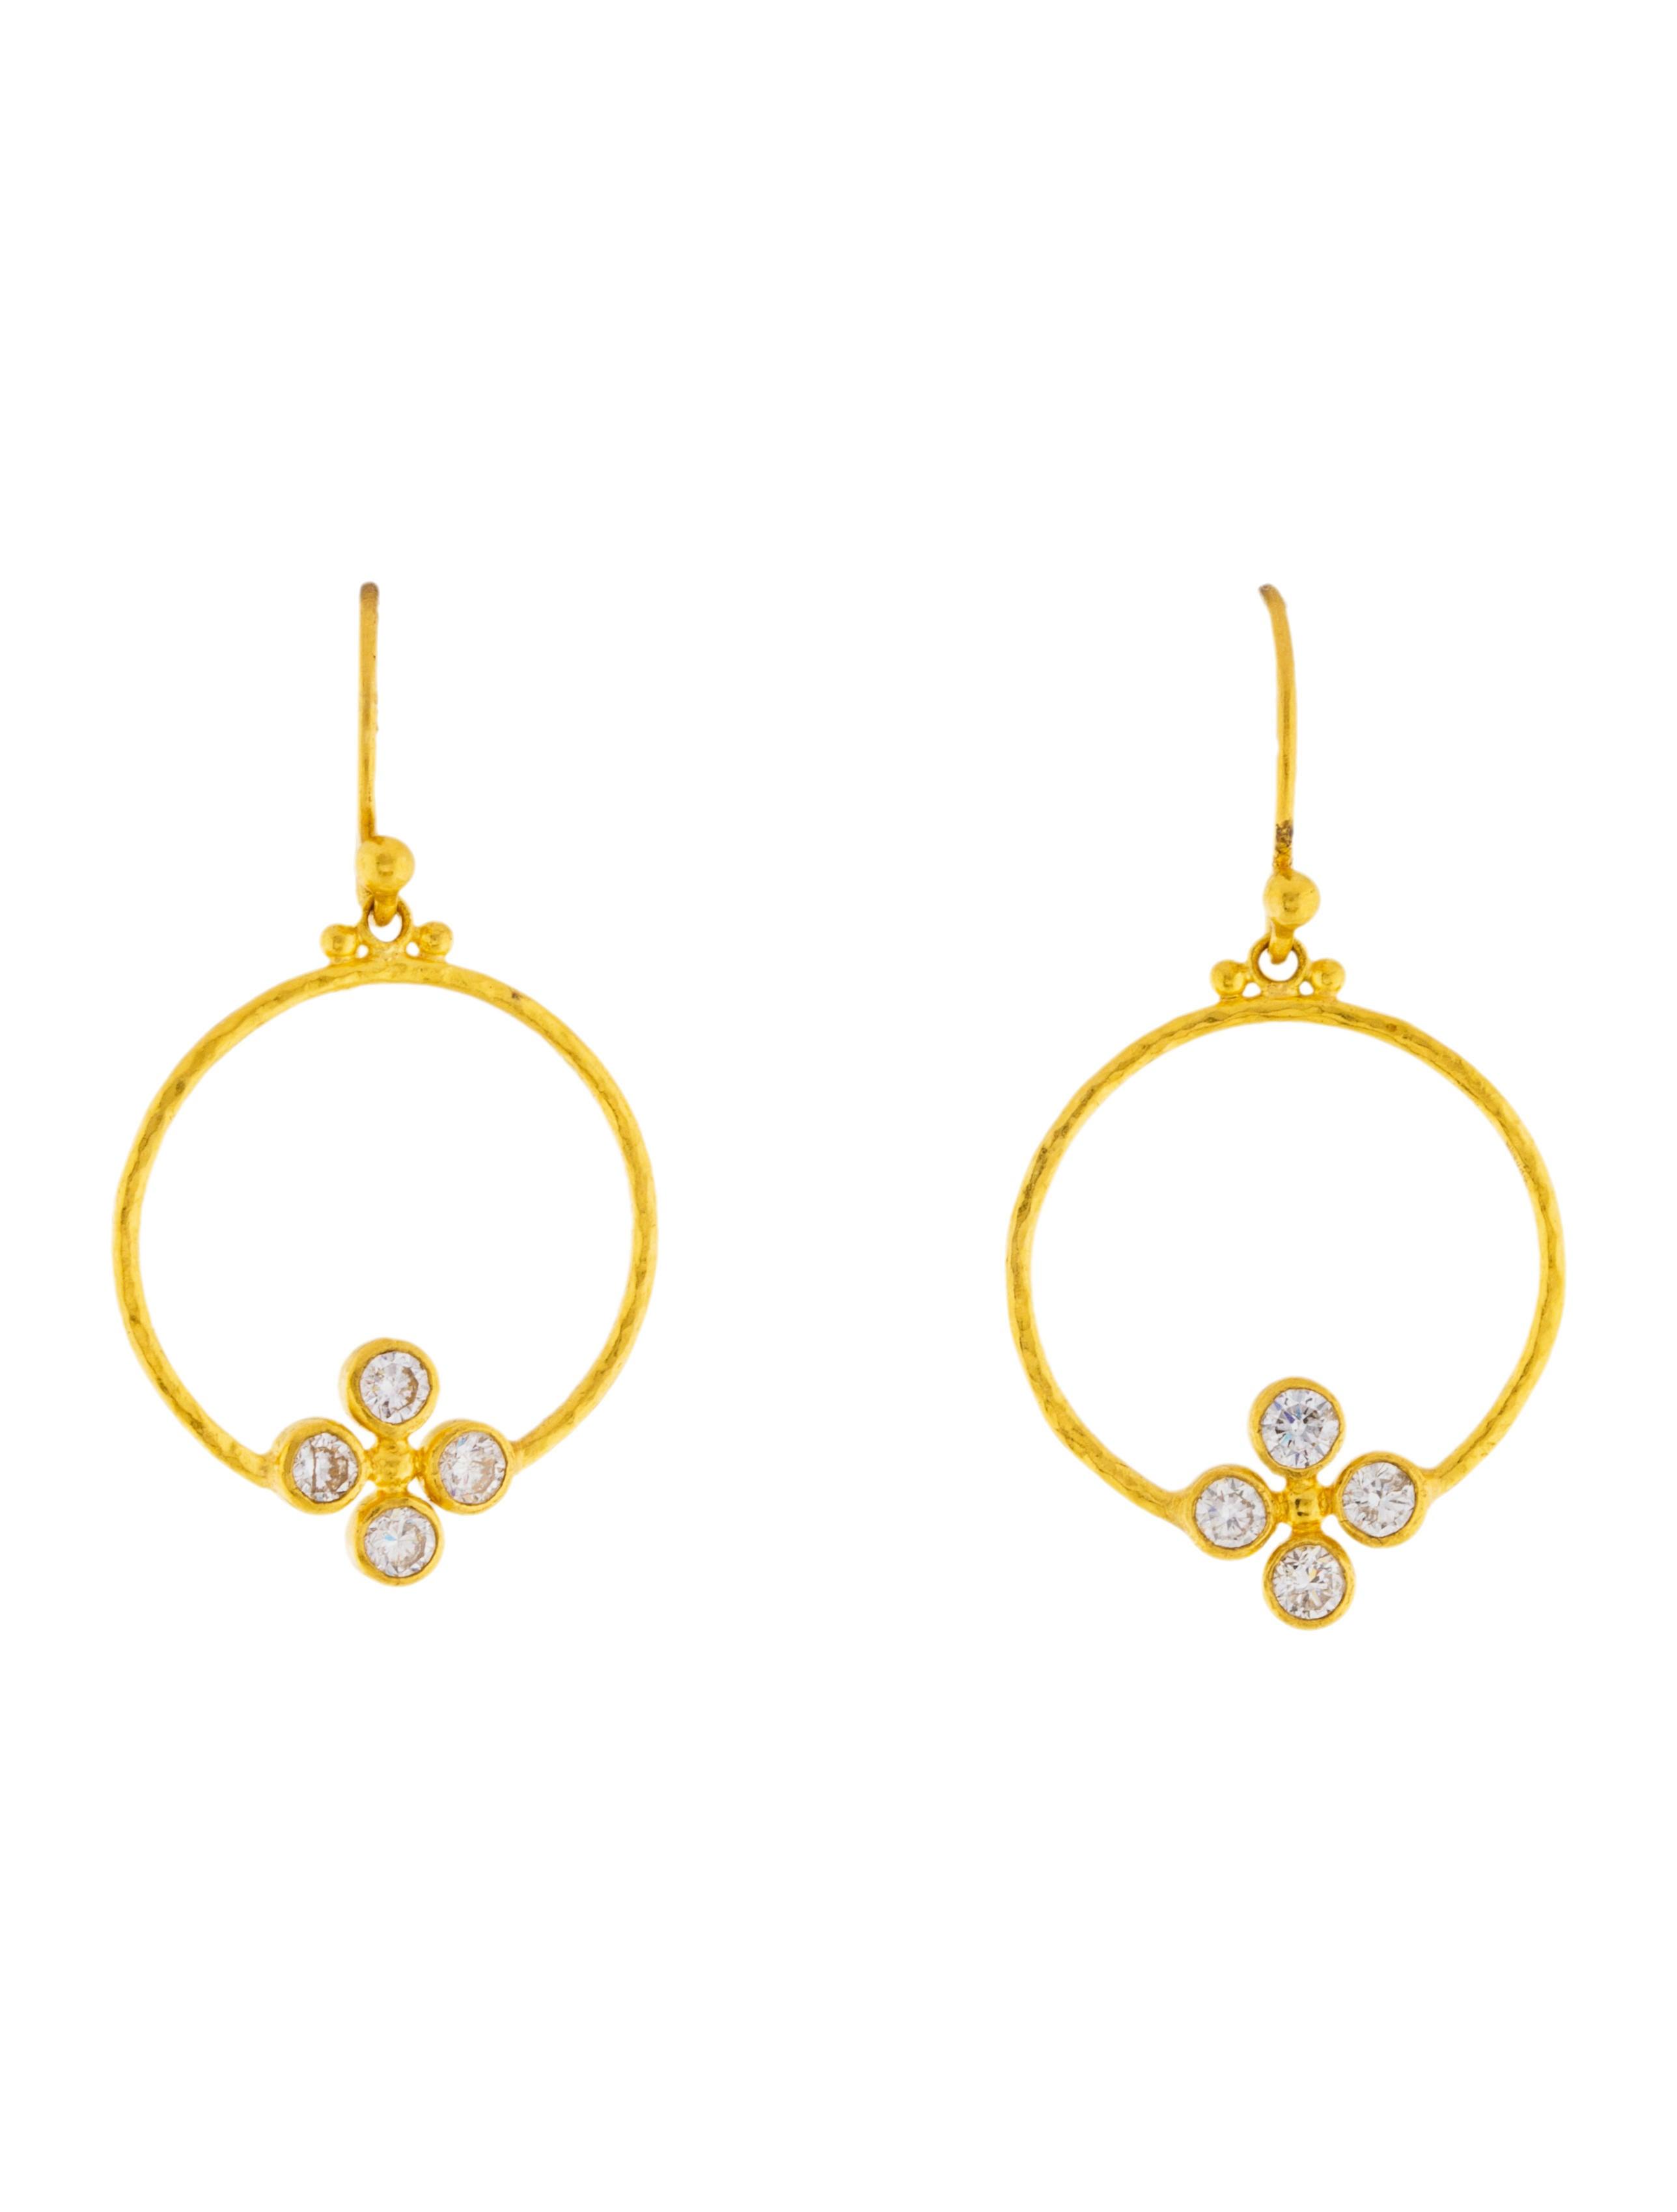 Gurhan Clover 24k Circular Diamond Drop Earrings fcI5Glcj